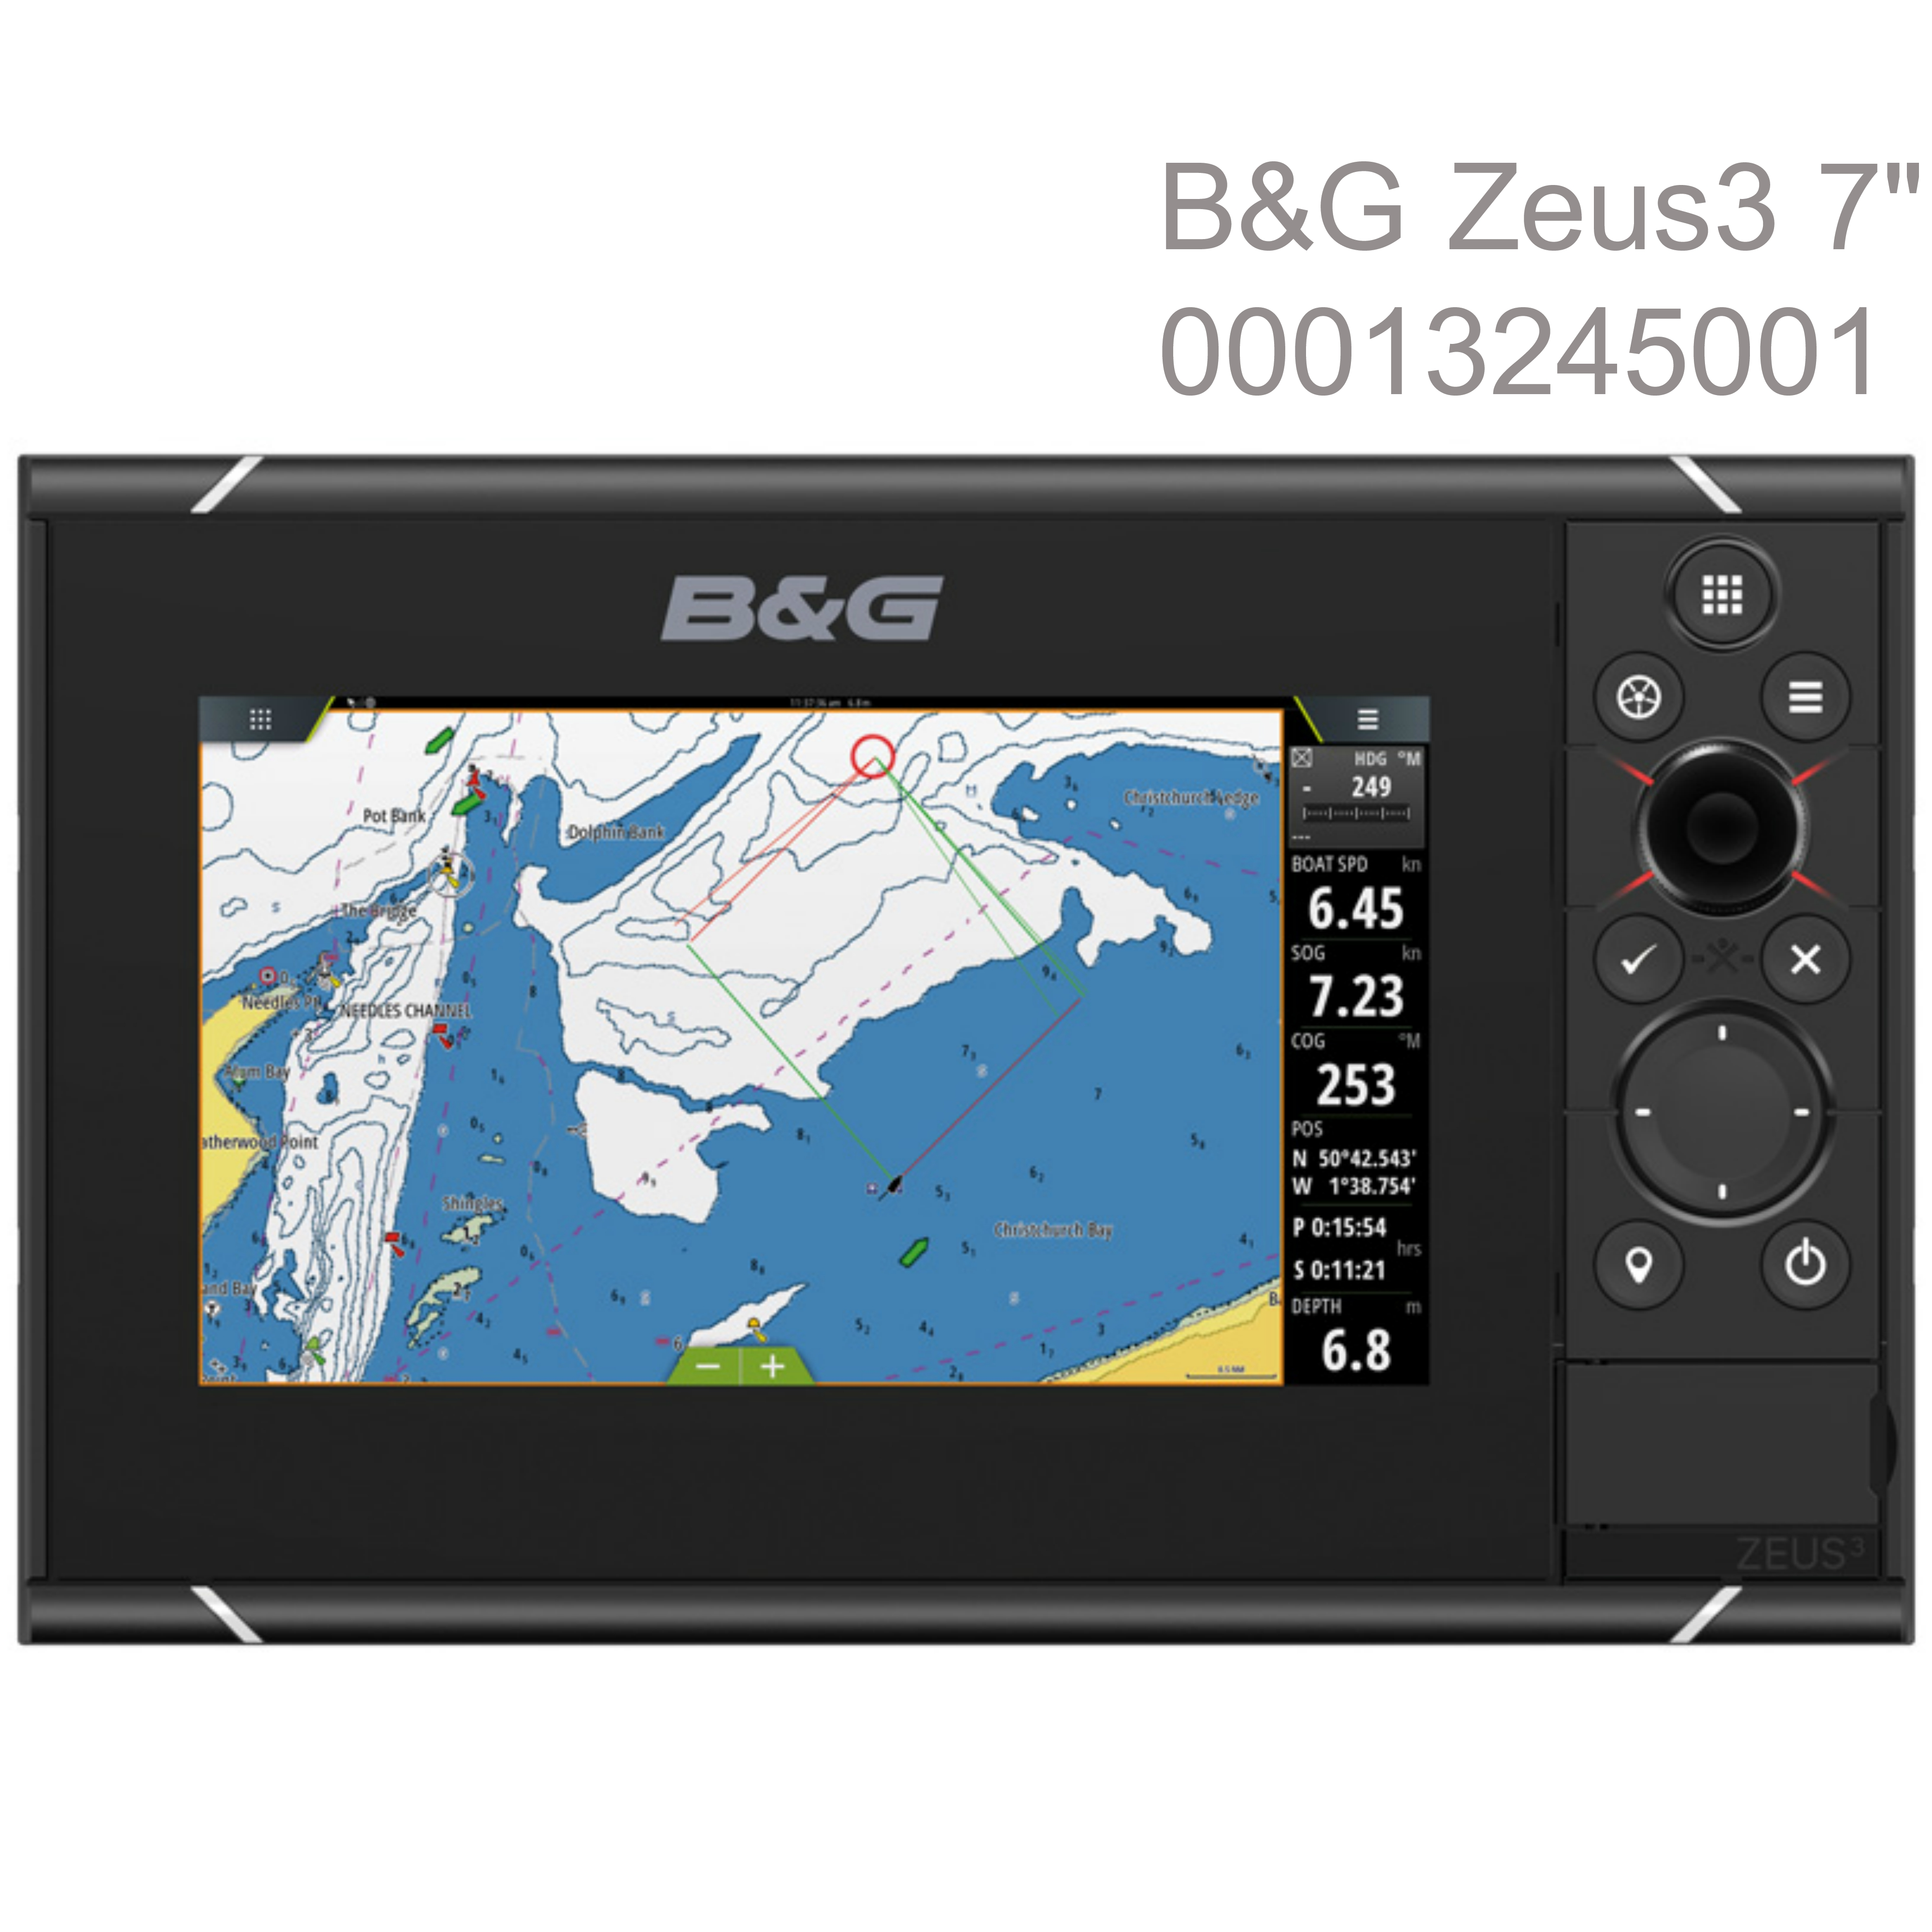 "B&G Zeus3 -7""|MFD Chartplotter|HD World Base Map|GPS|WiFi|For Cruisers & Racers"